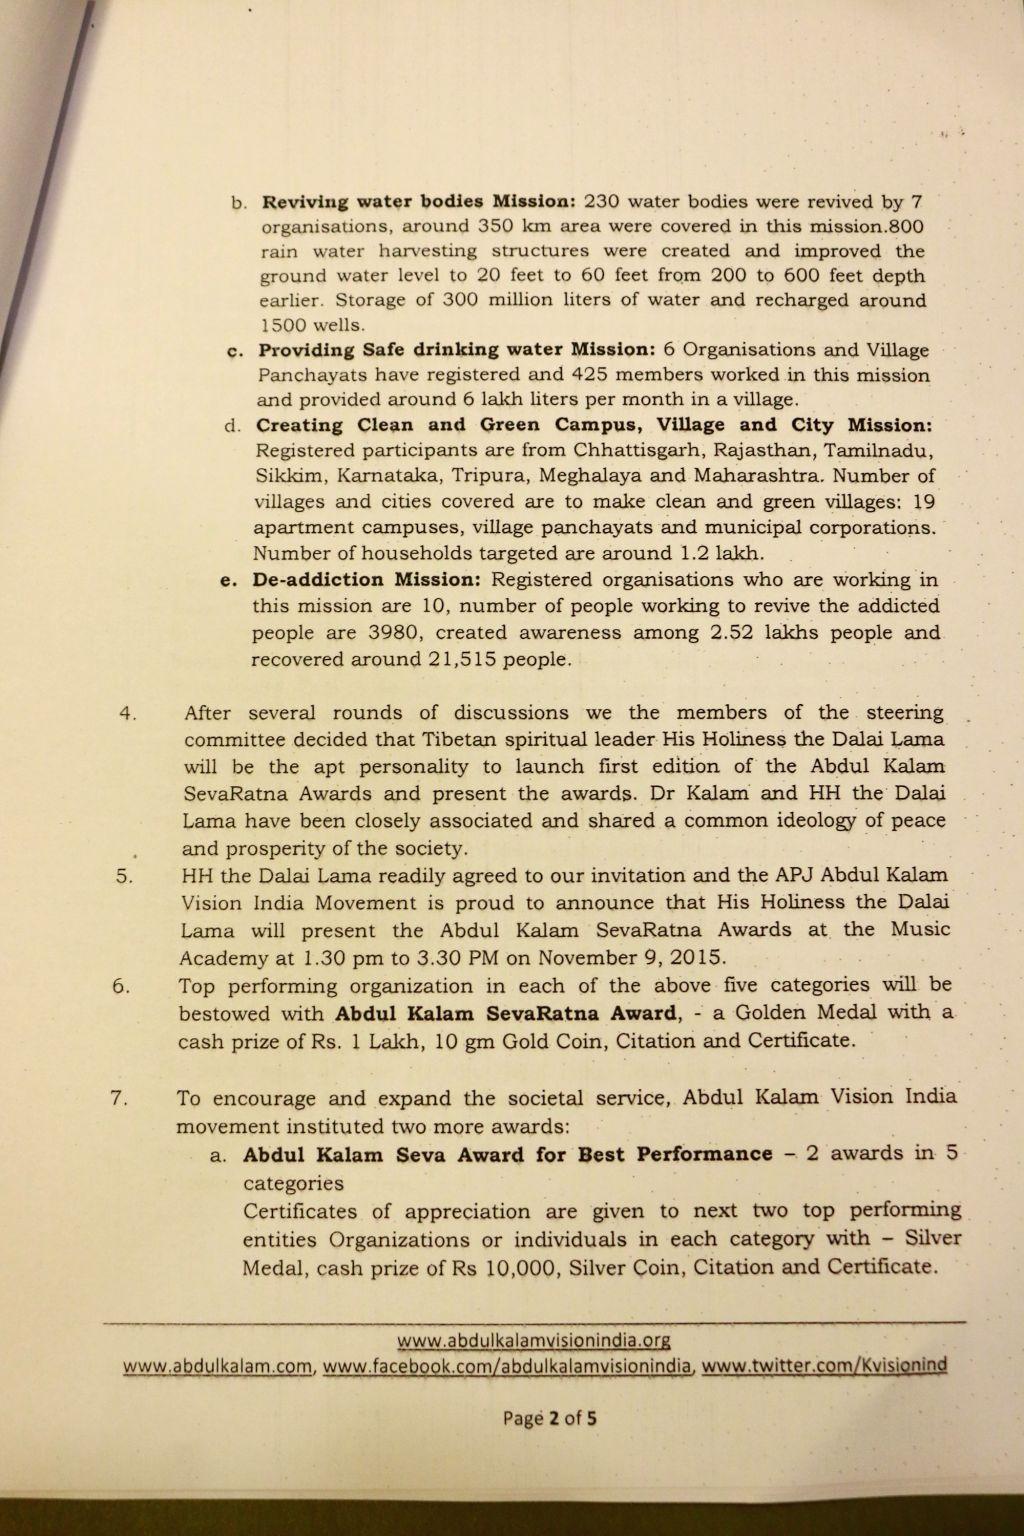 Abdul Kalam Seva Ratna Awards 2015 Press Meet Event Stills